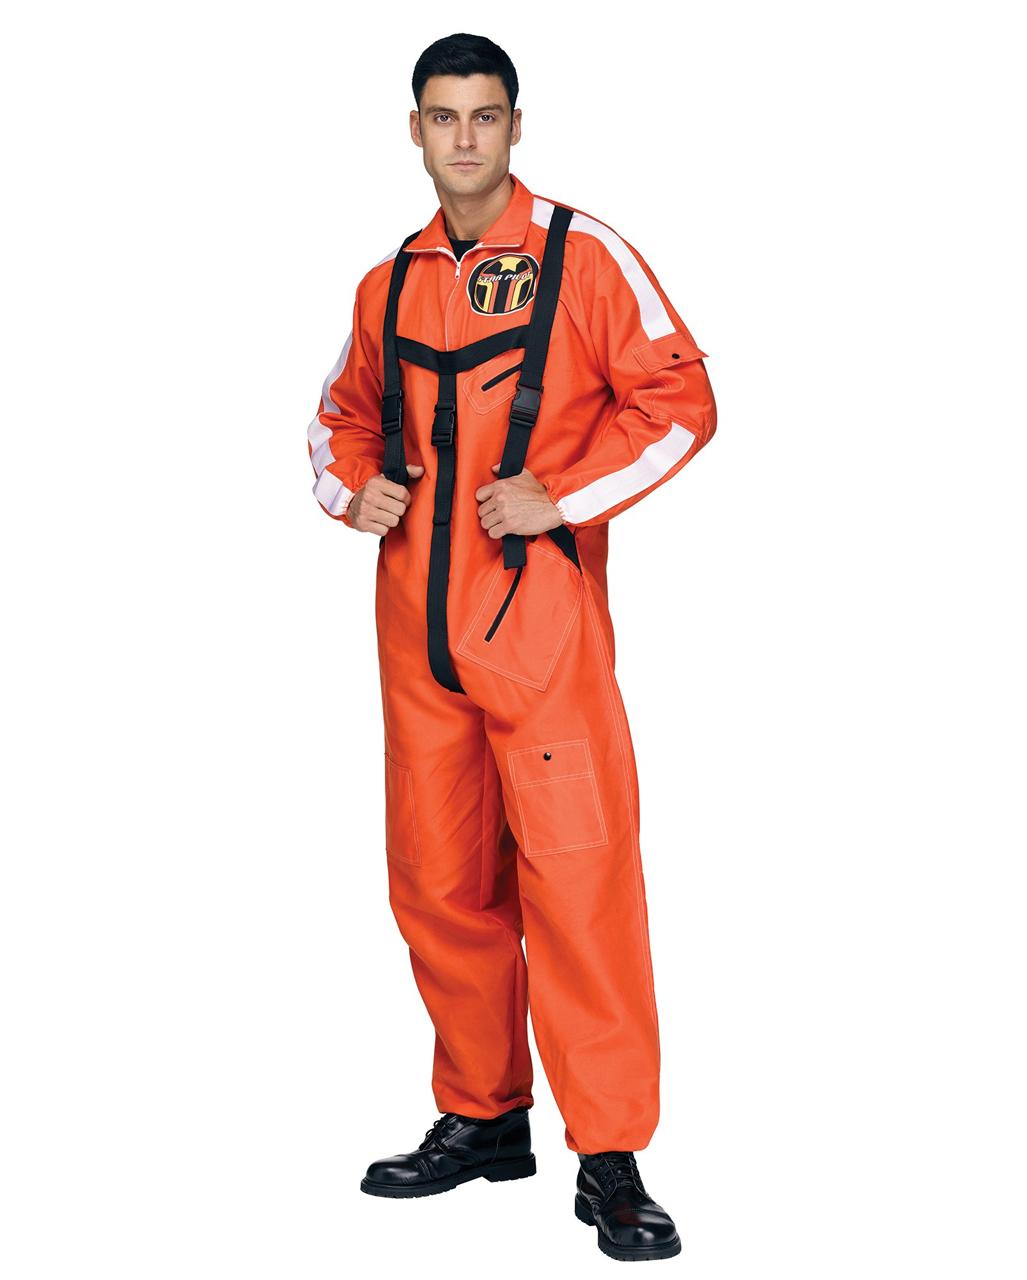 Sternen Krieger Pilot Kostum Fur Manner Karneval Universe